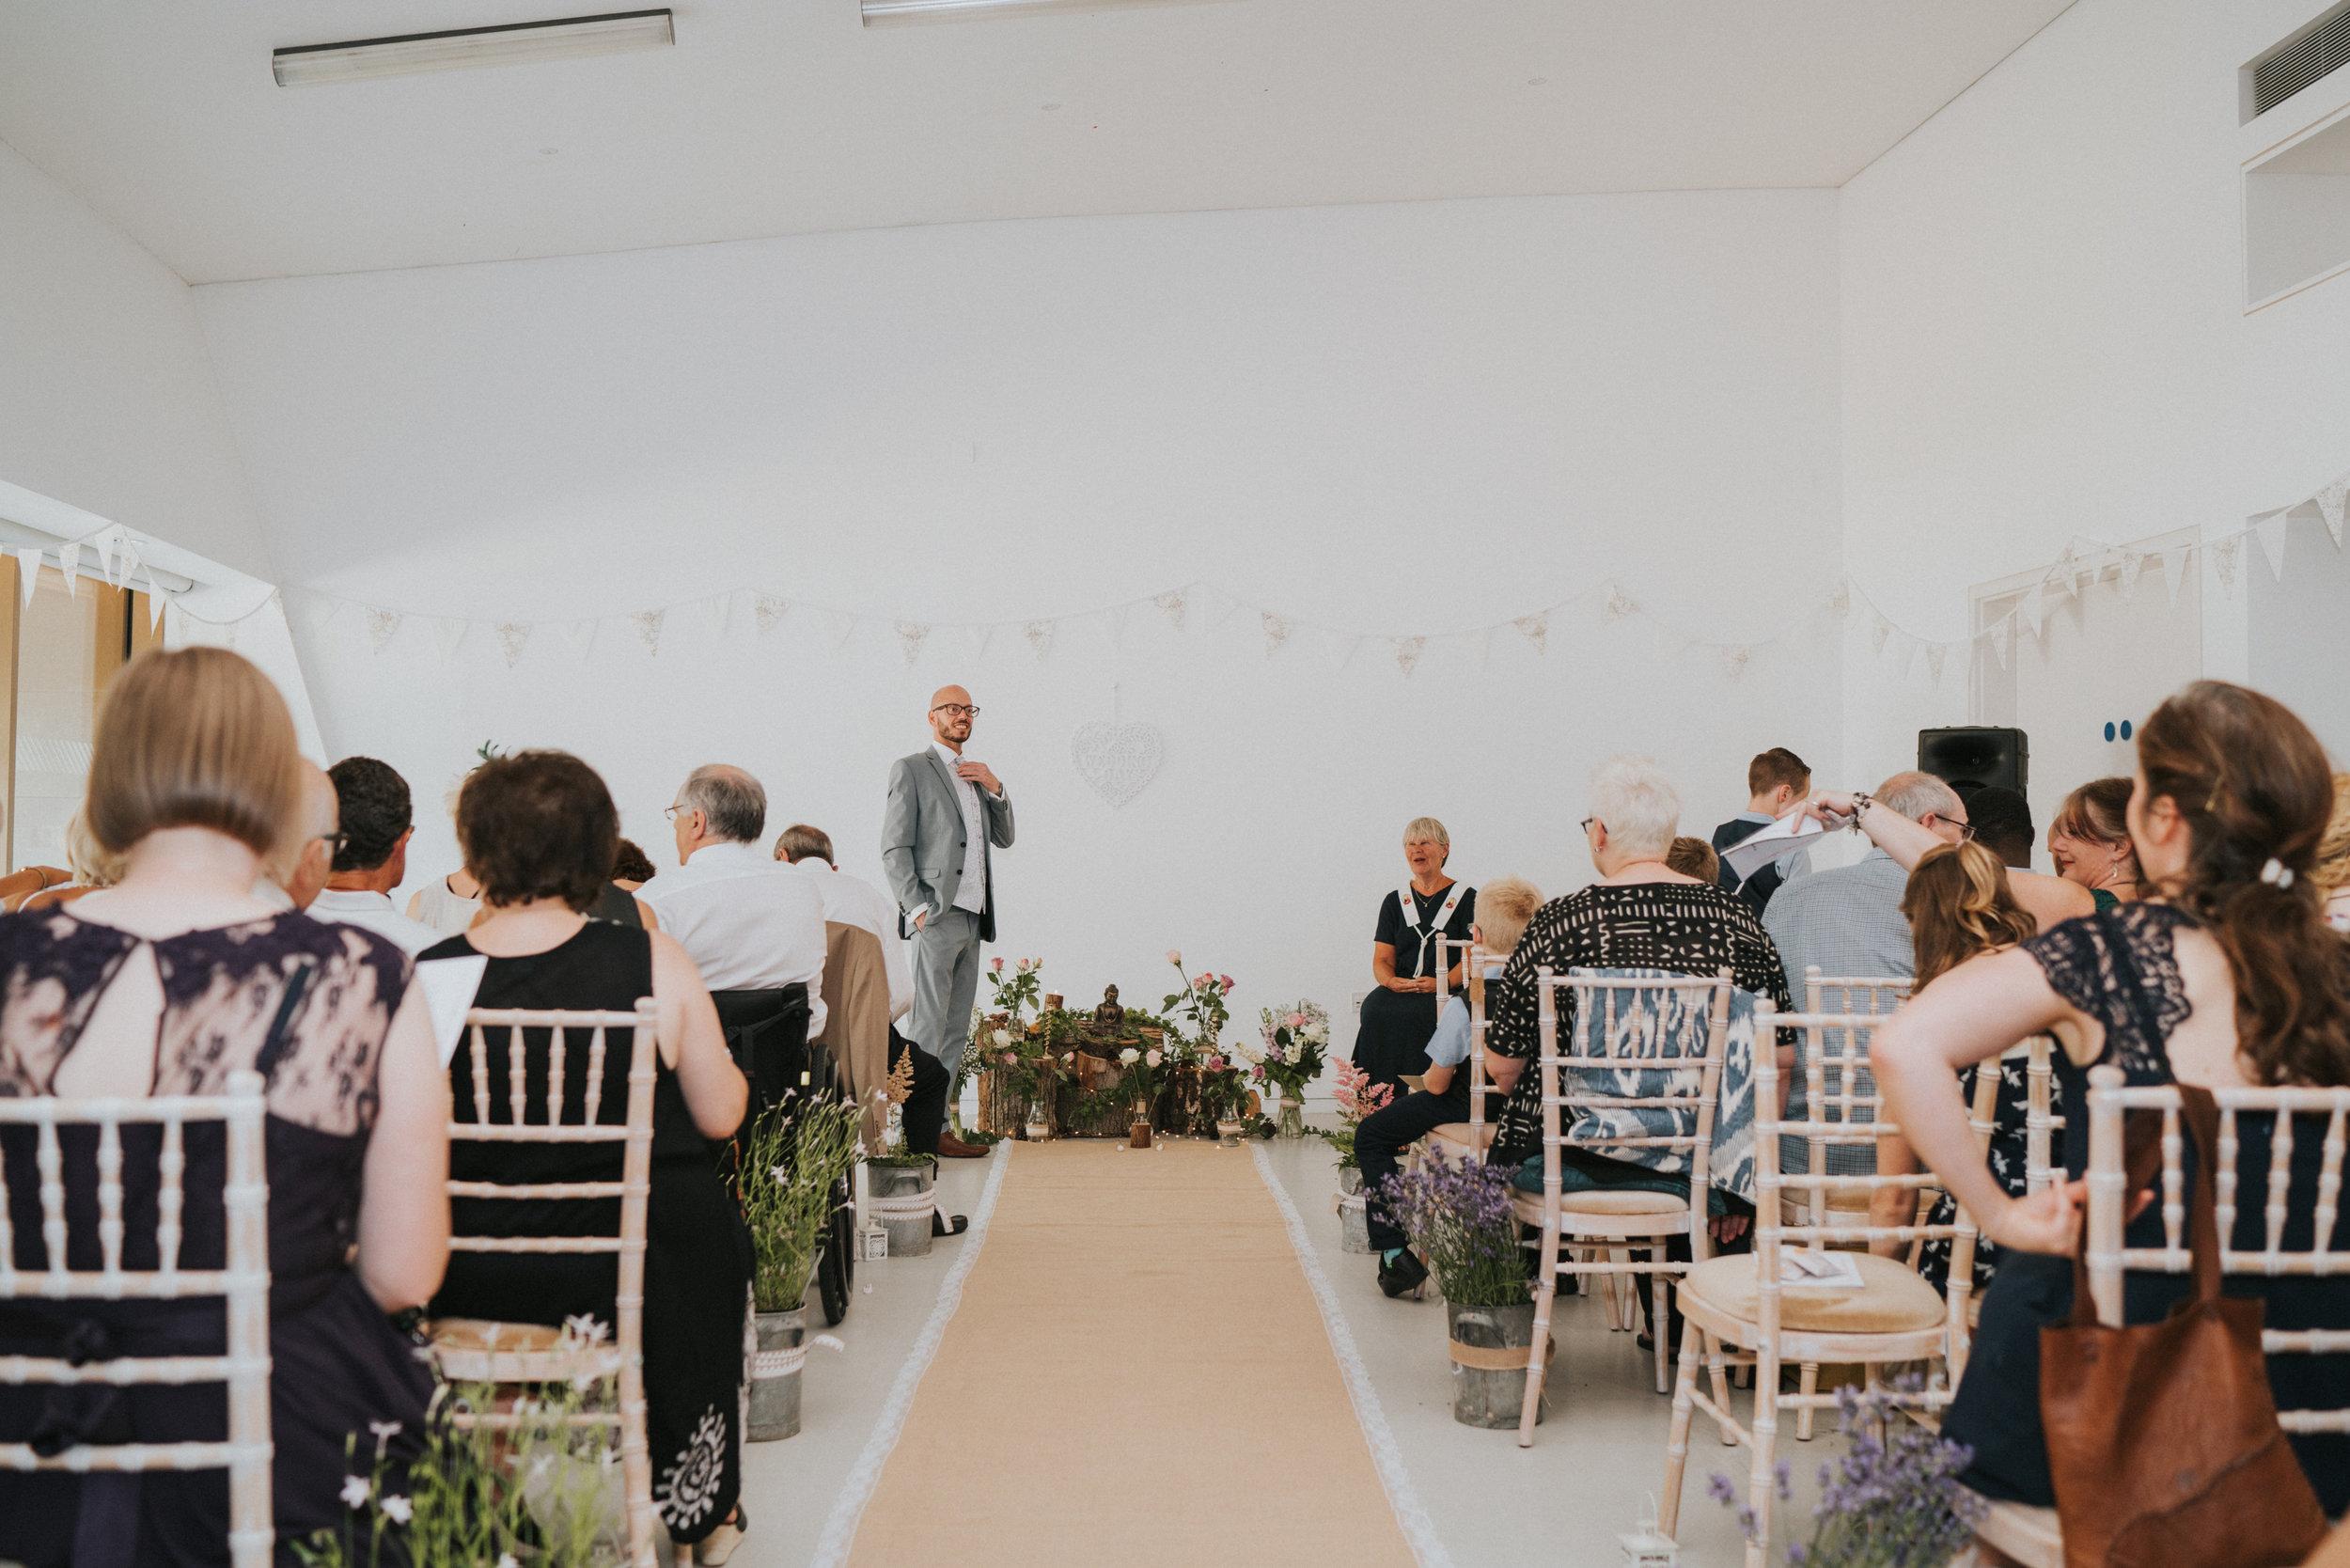 Grace-Elizabeth-Georgie-Amalaketu-Firstsite-Colchester-Essex-Boho-Buddhist-Wedding-Alternative-Wedding-Photography-Essex (36 of 100).jpg